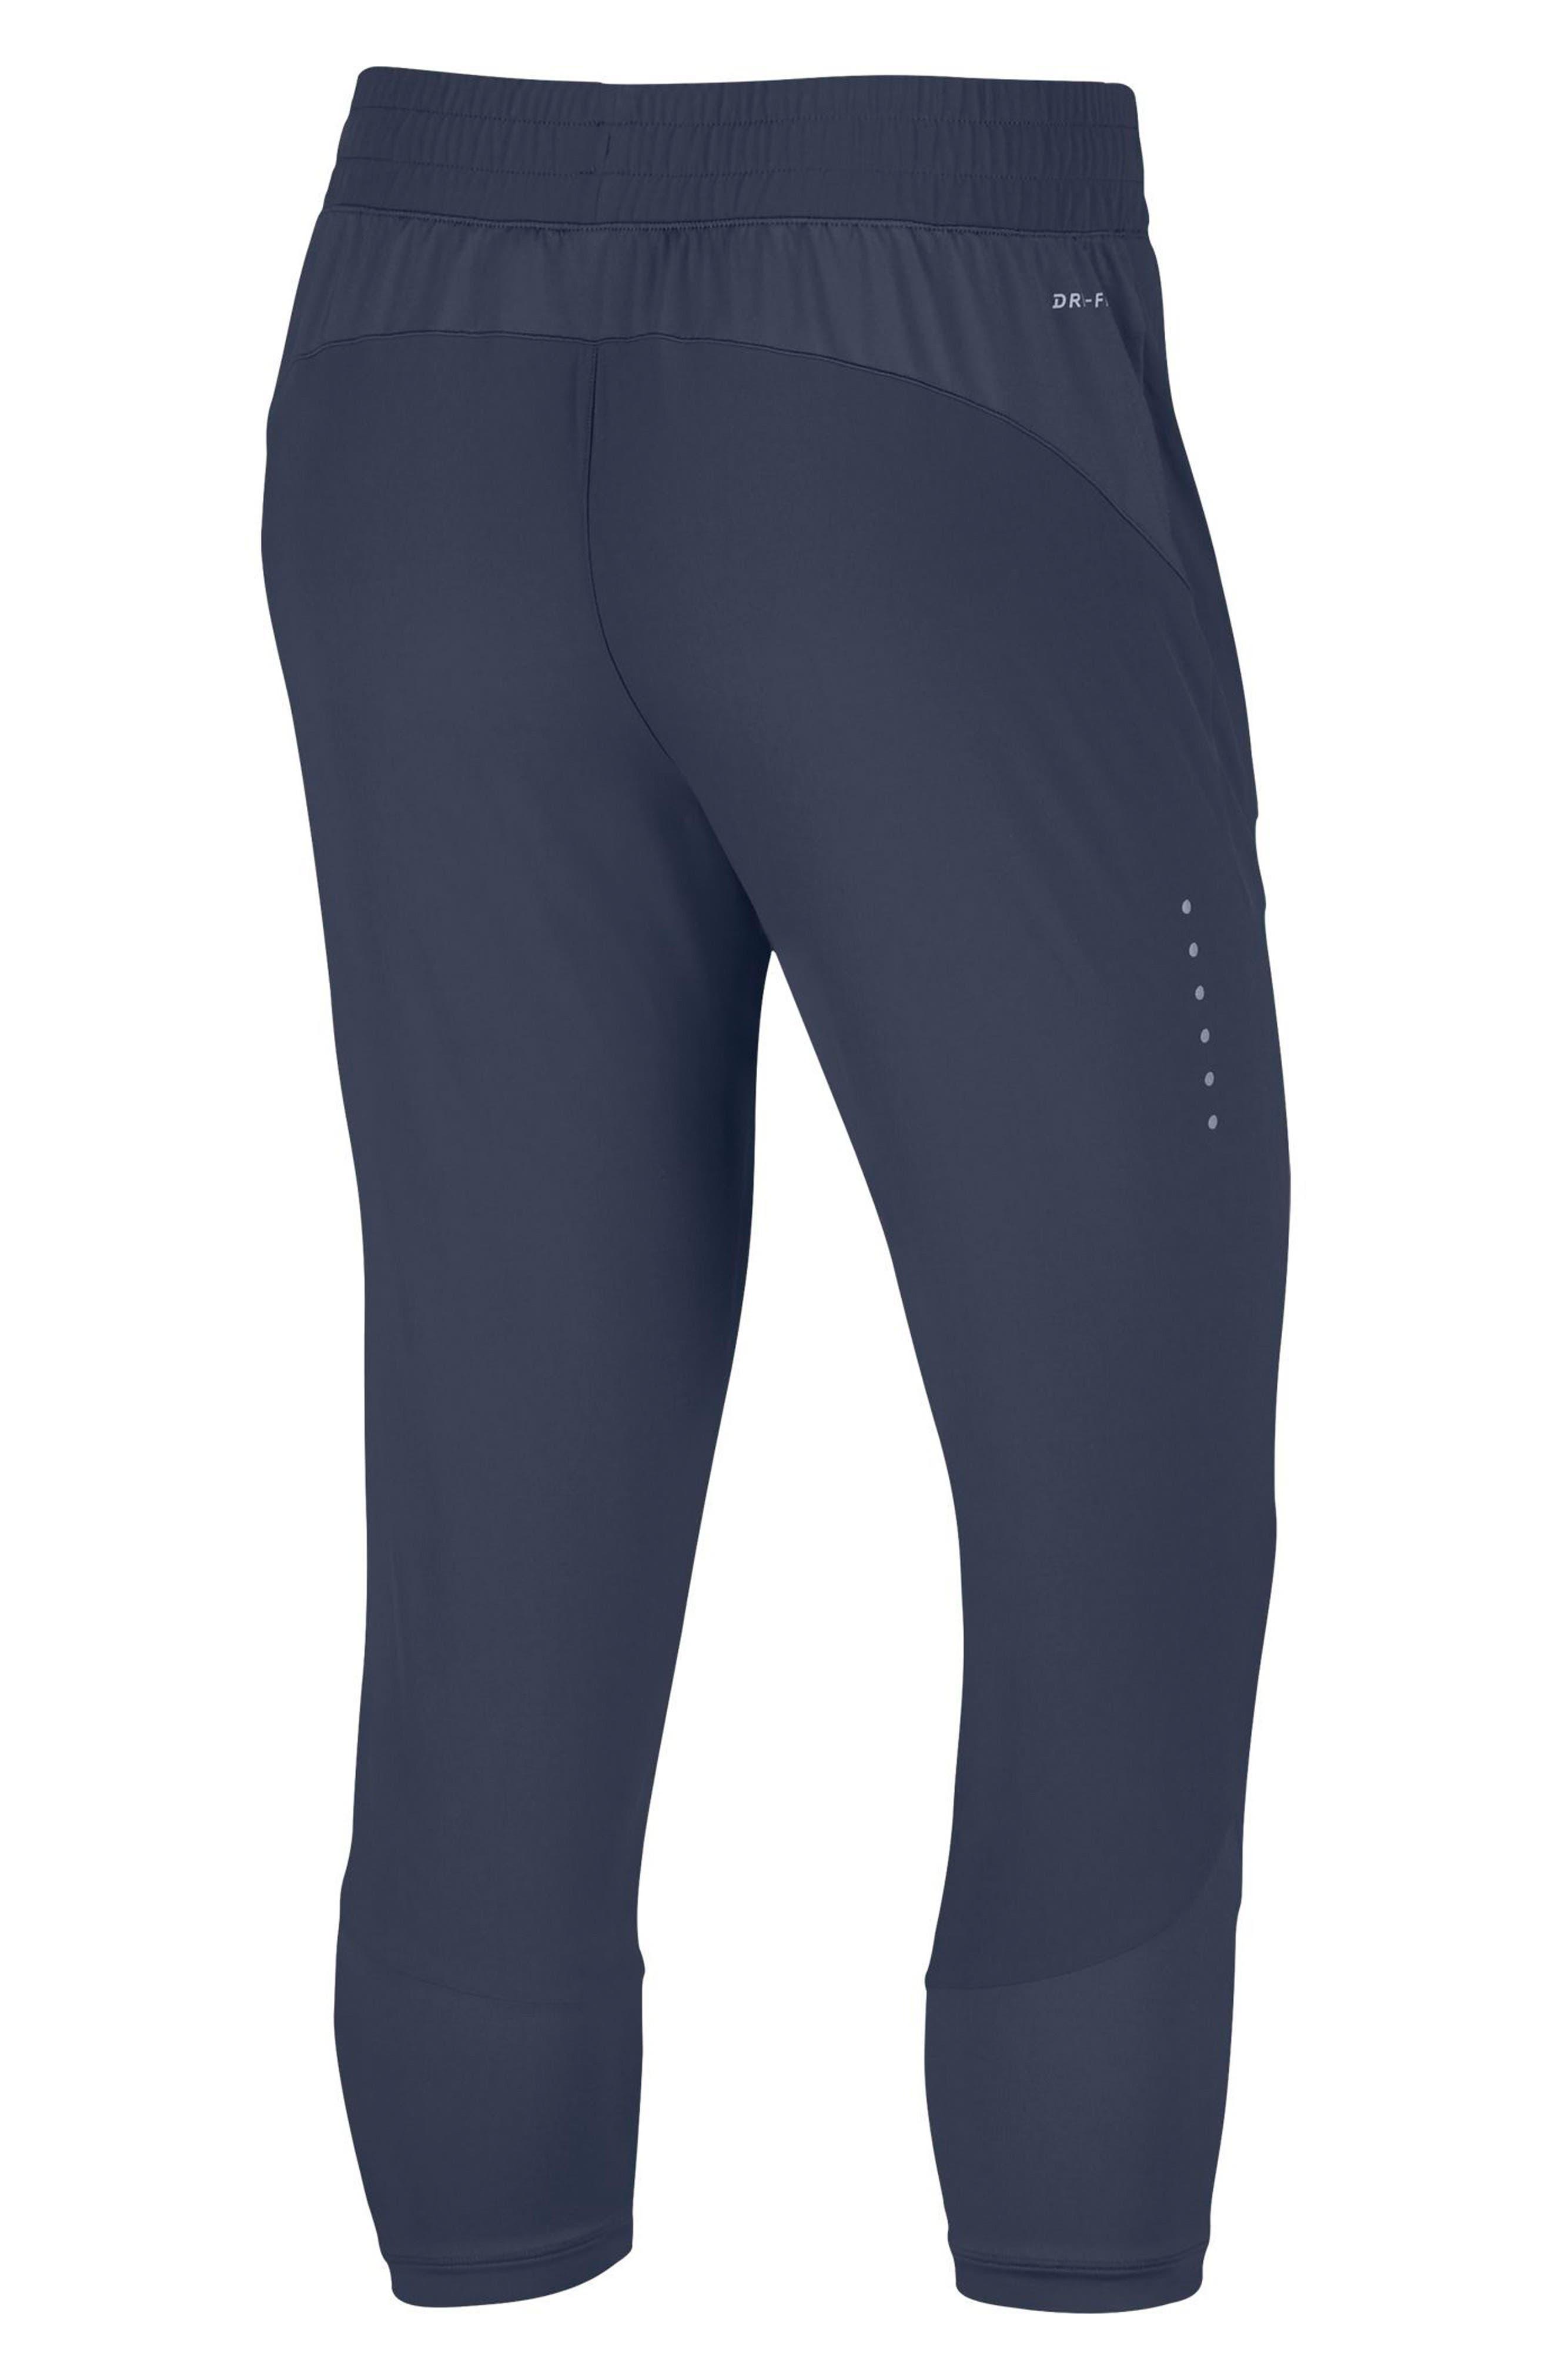 Women's Flex Swift Running Crop Pants,                             Alternate thumbnail 2, color,                             Thunder Blue